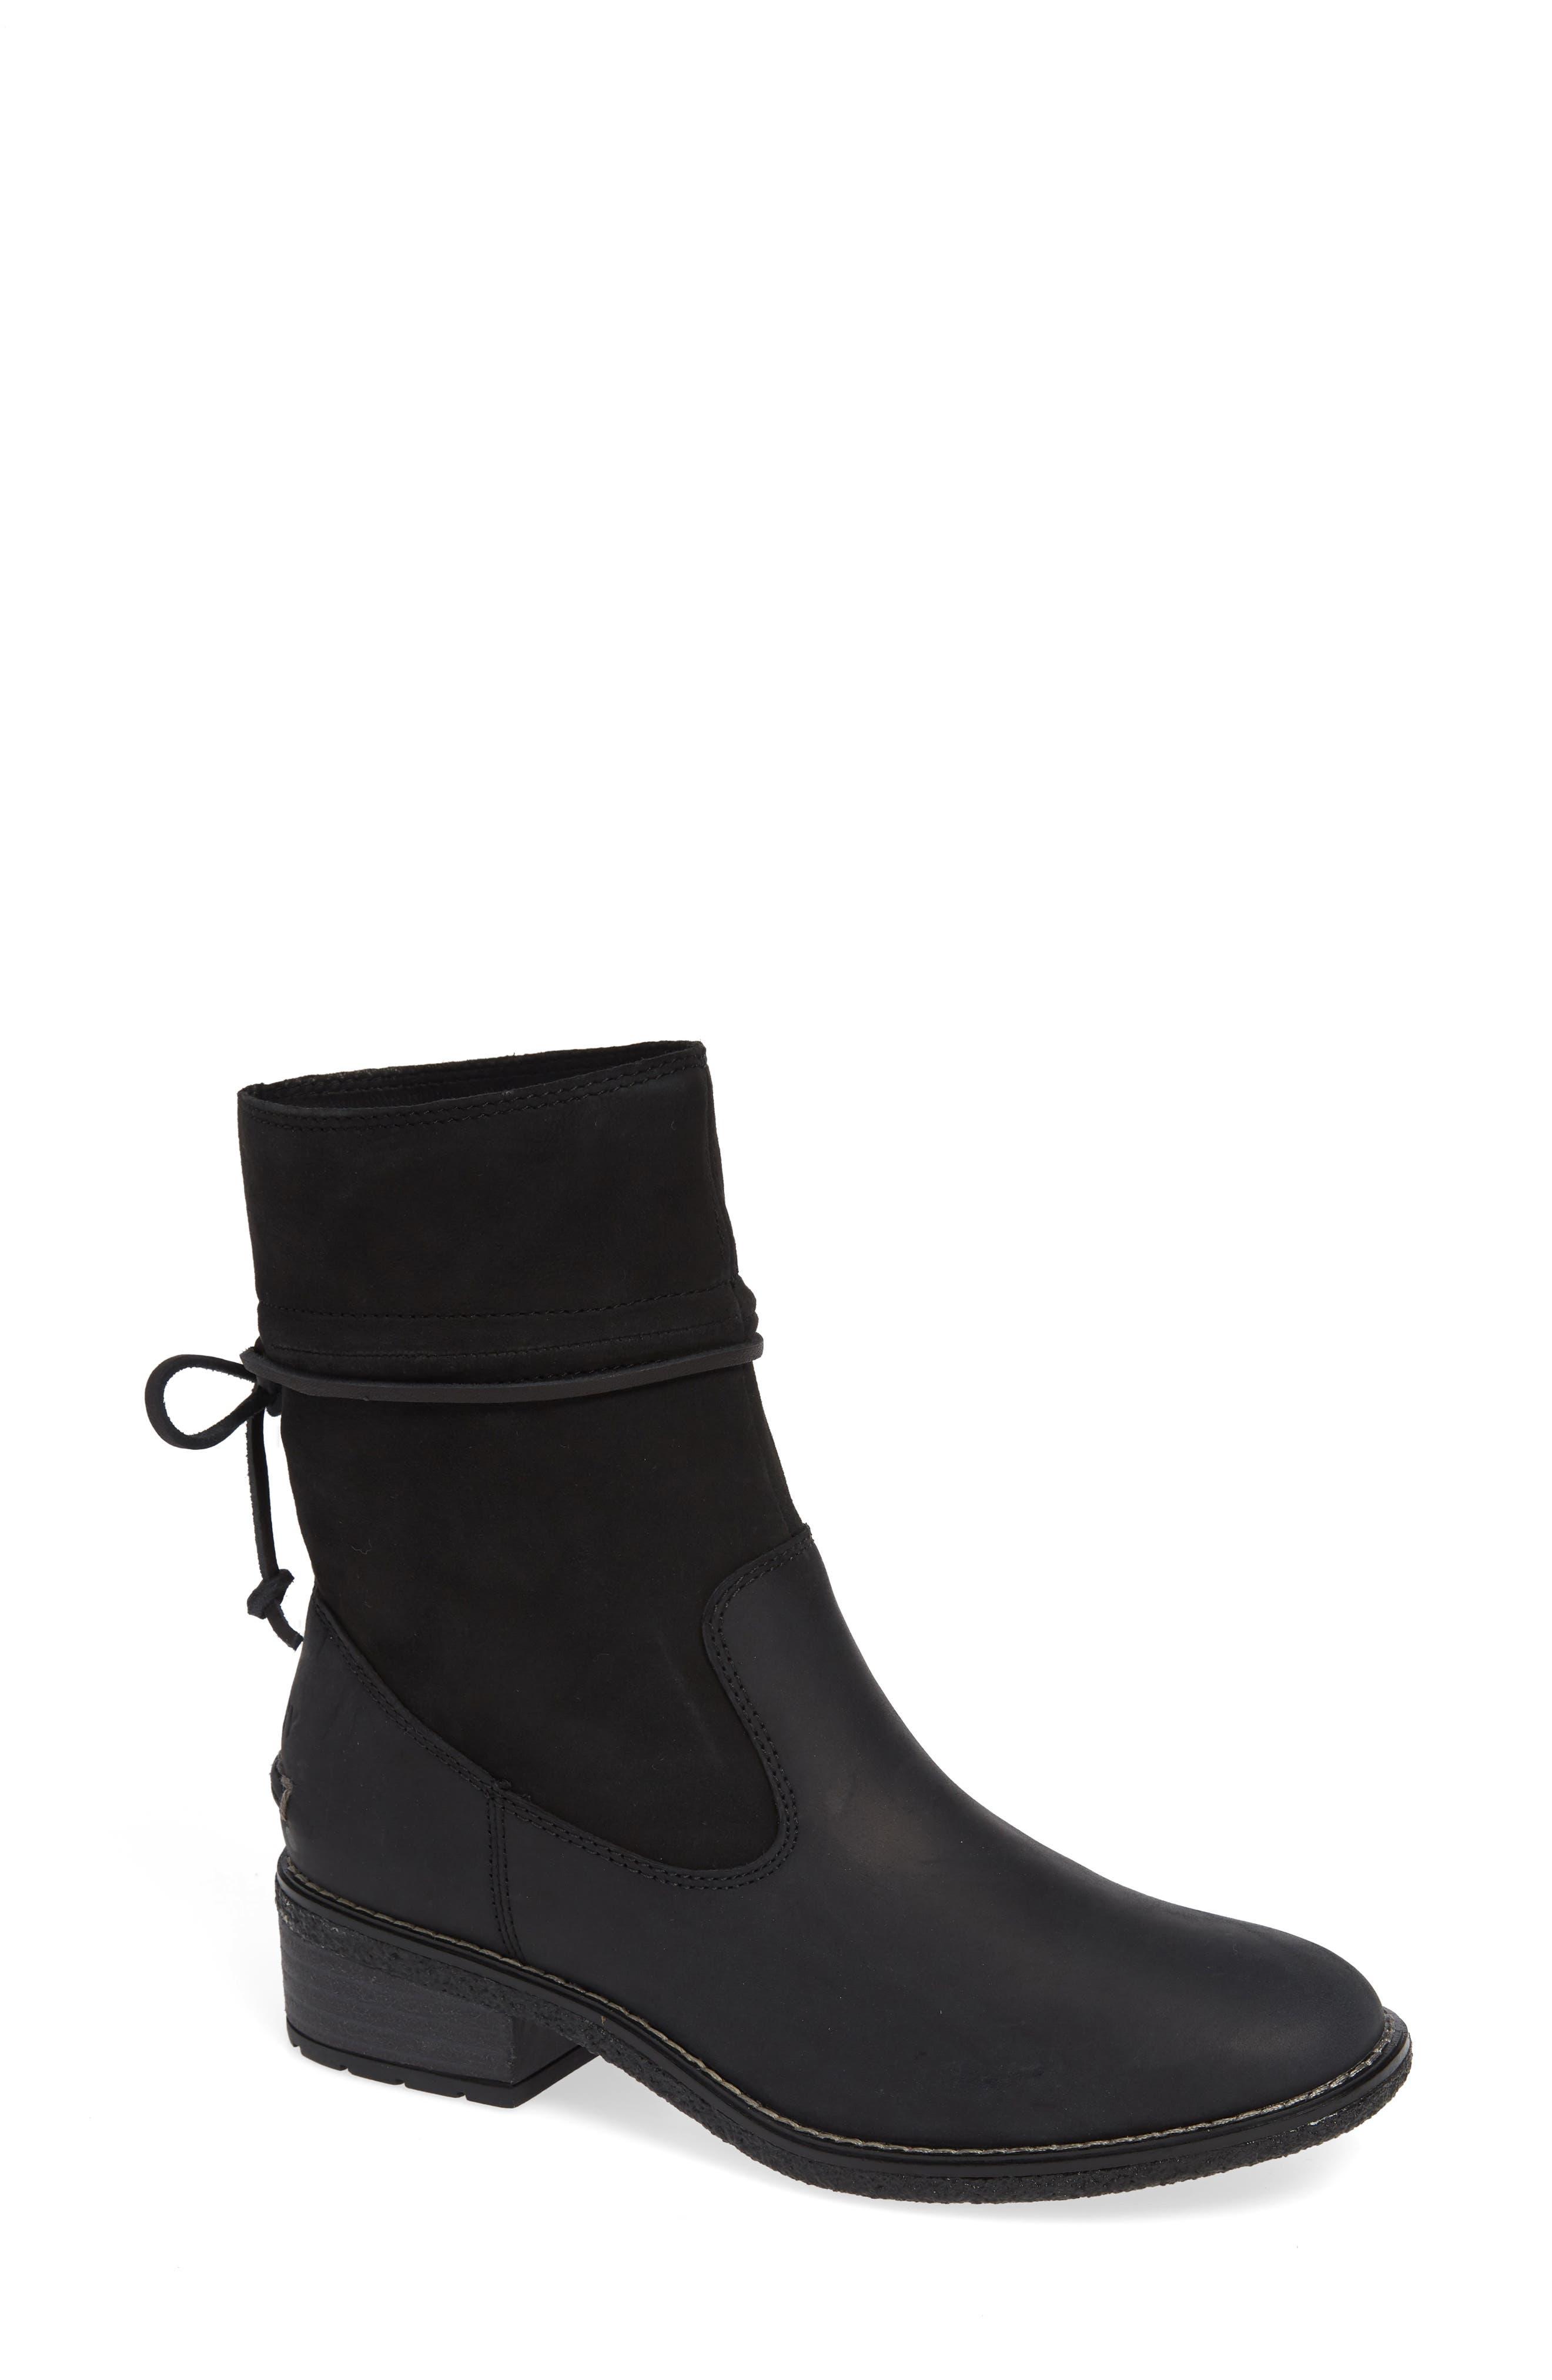 c1e546ee6f1d Women s Boots on SALE!  50 -  99.99